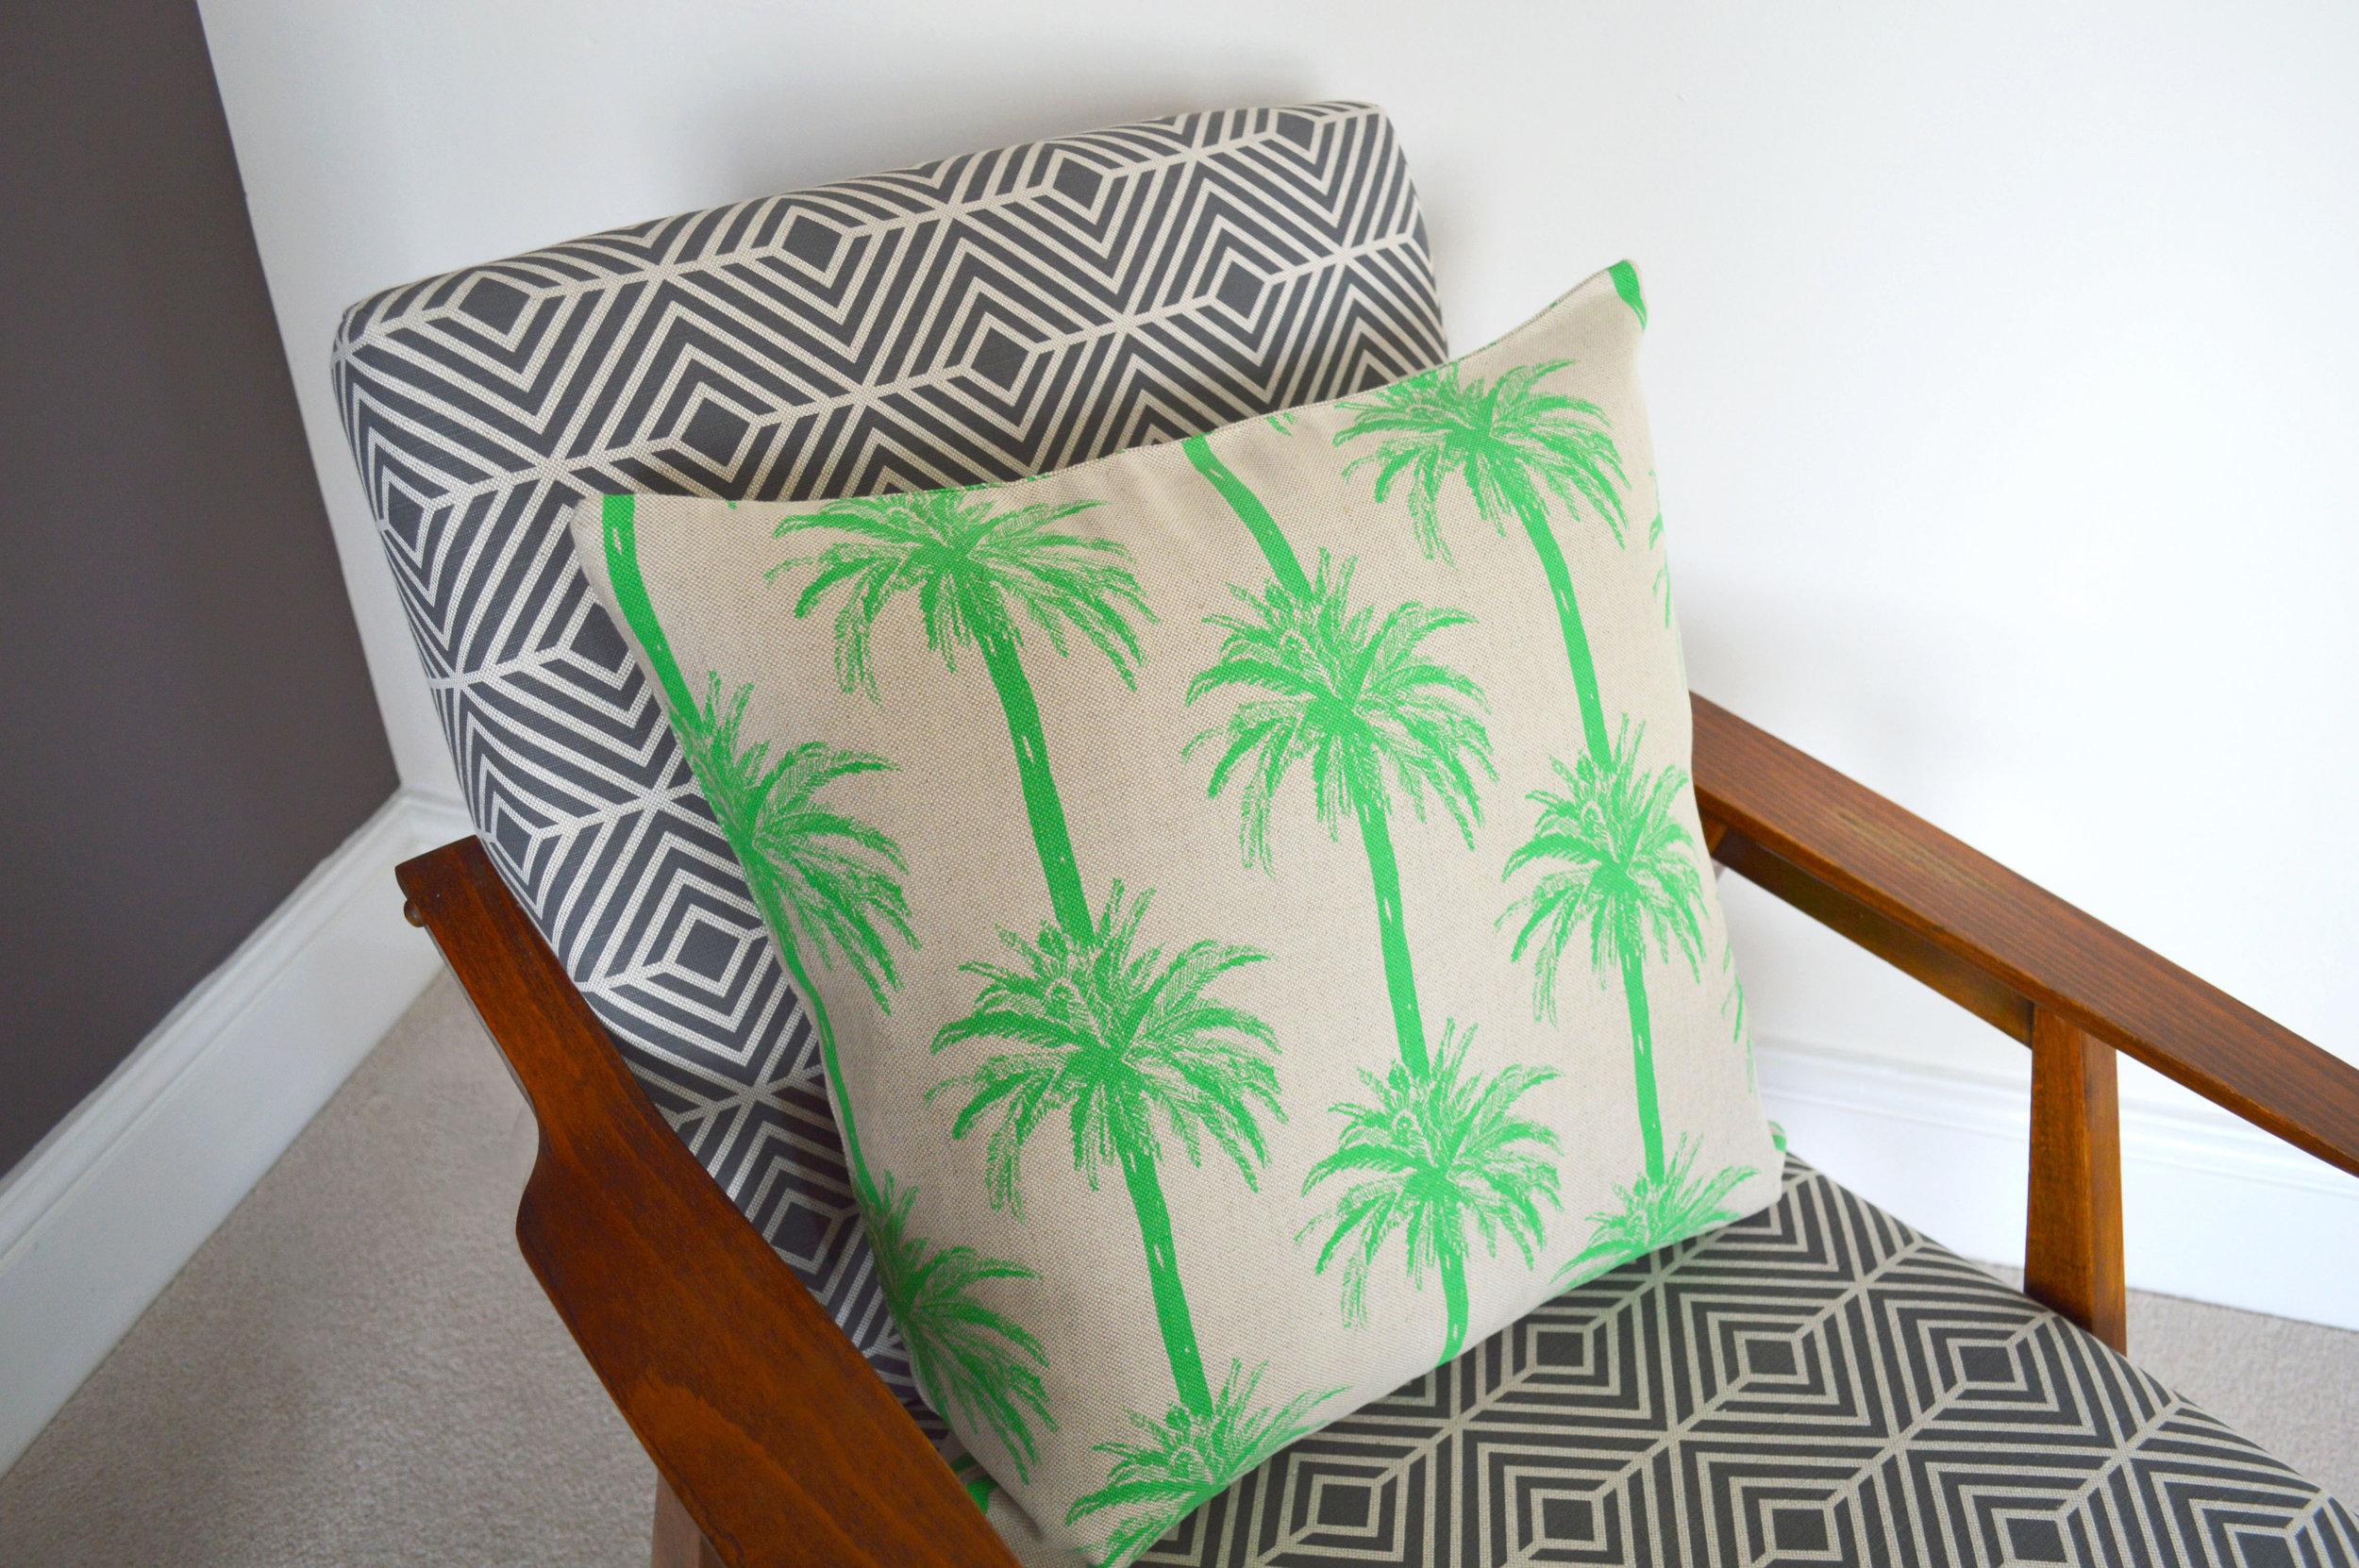 Palm Tree Cushion on Chair.jpg